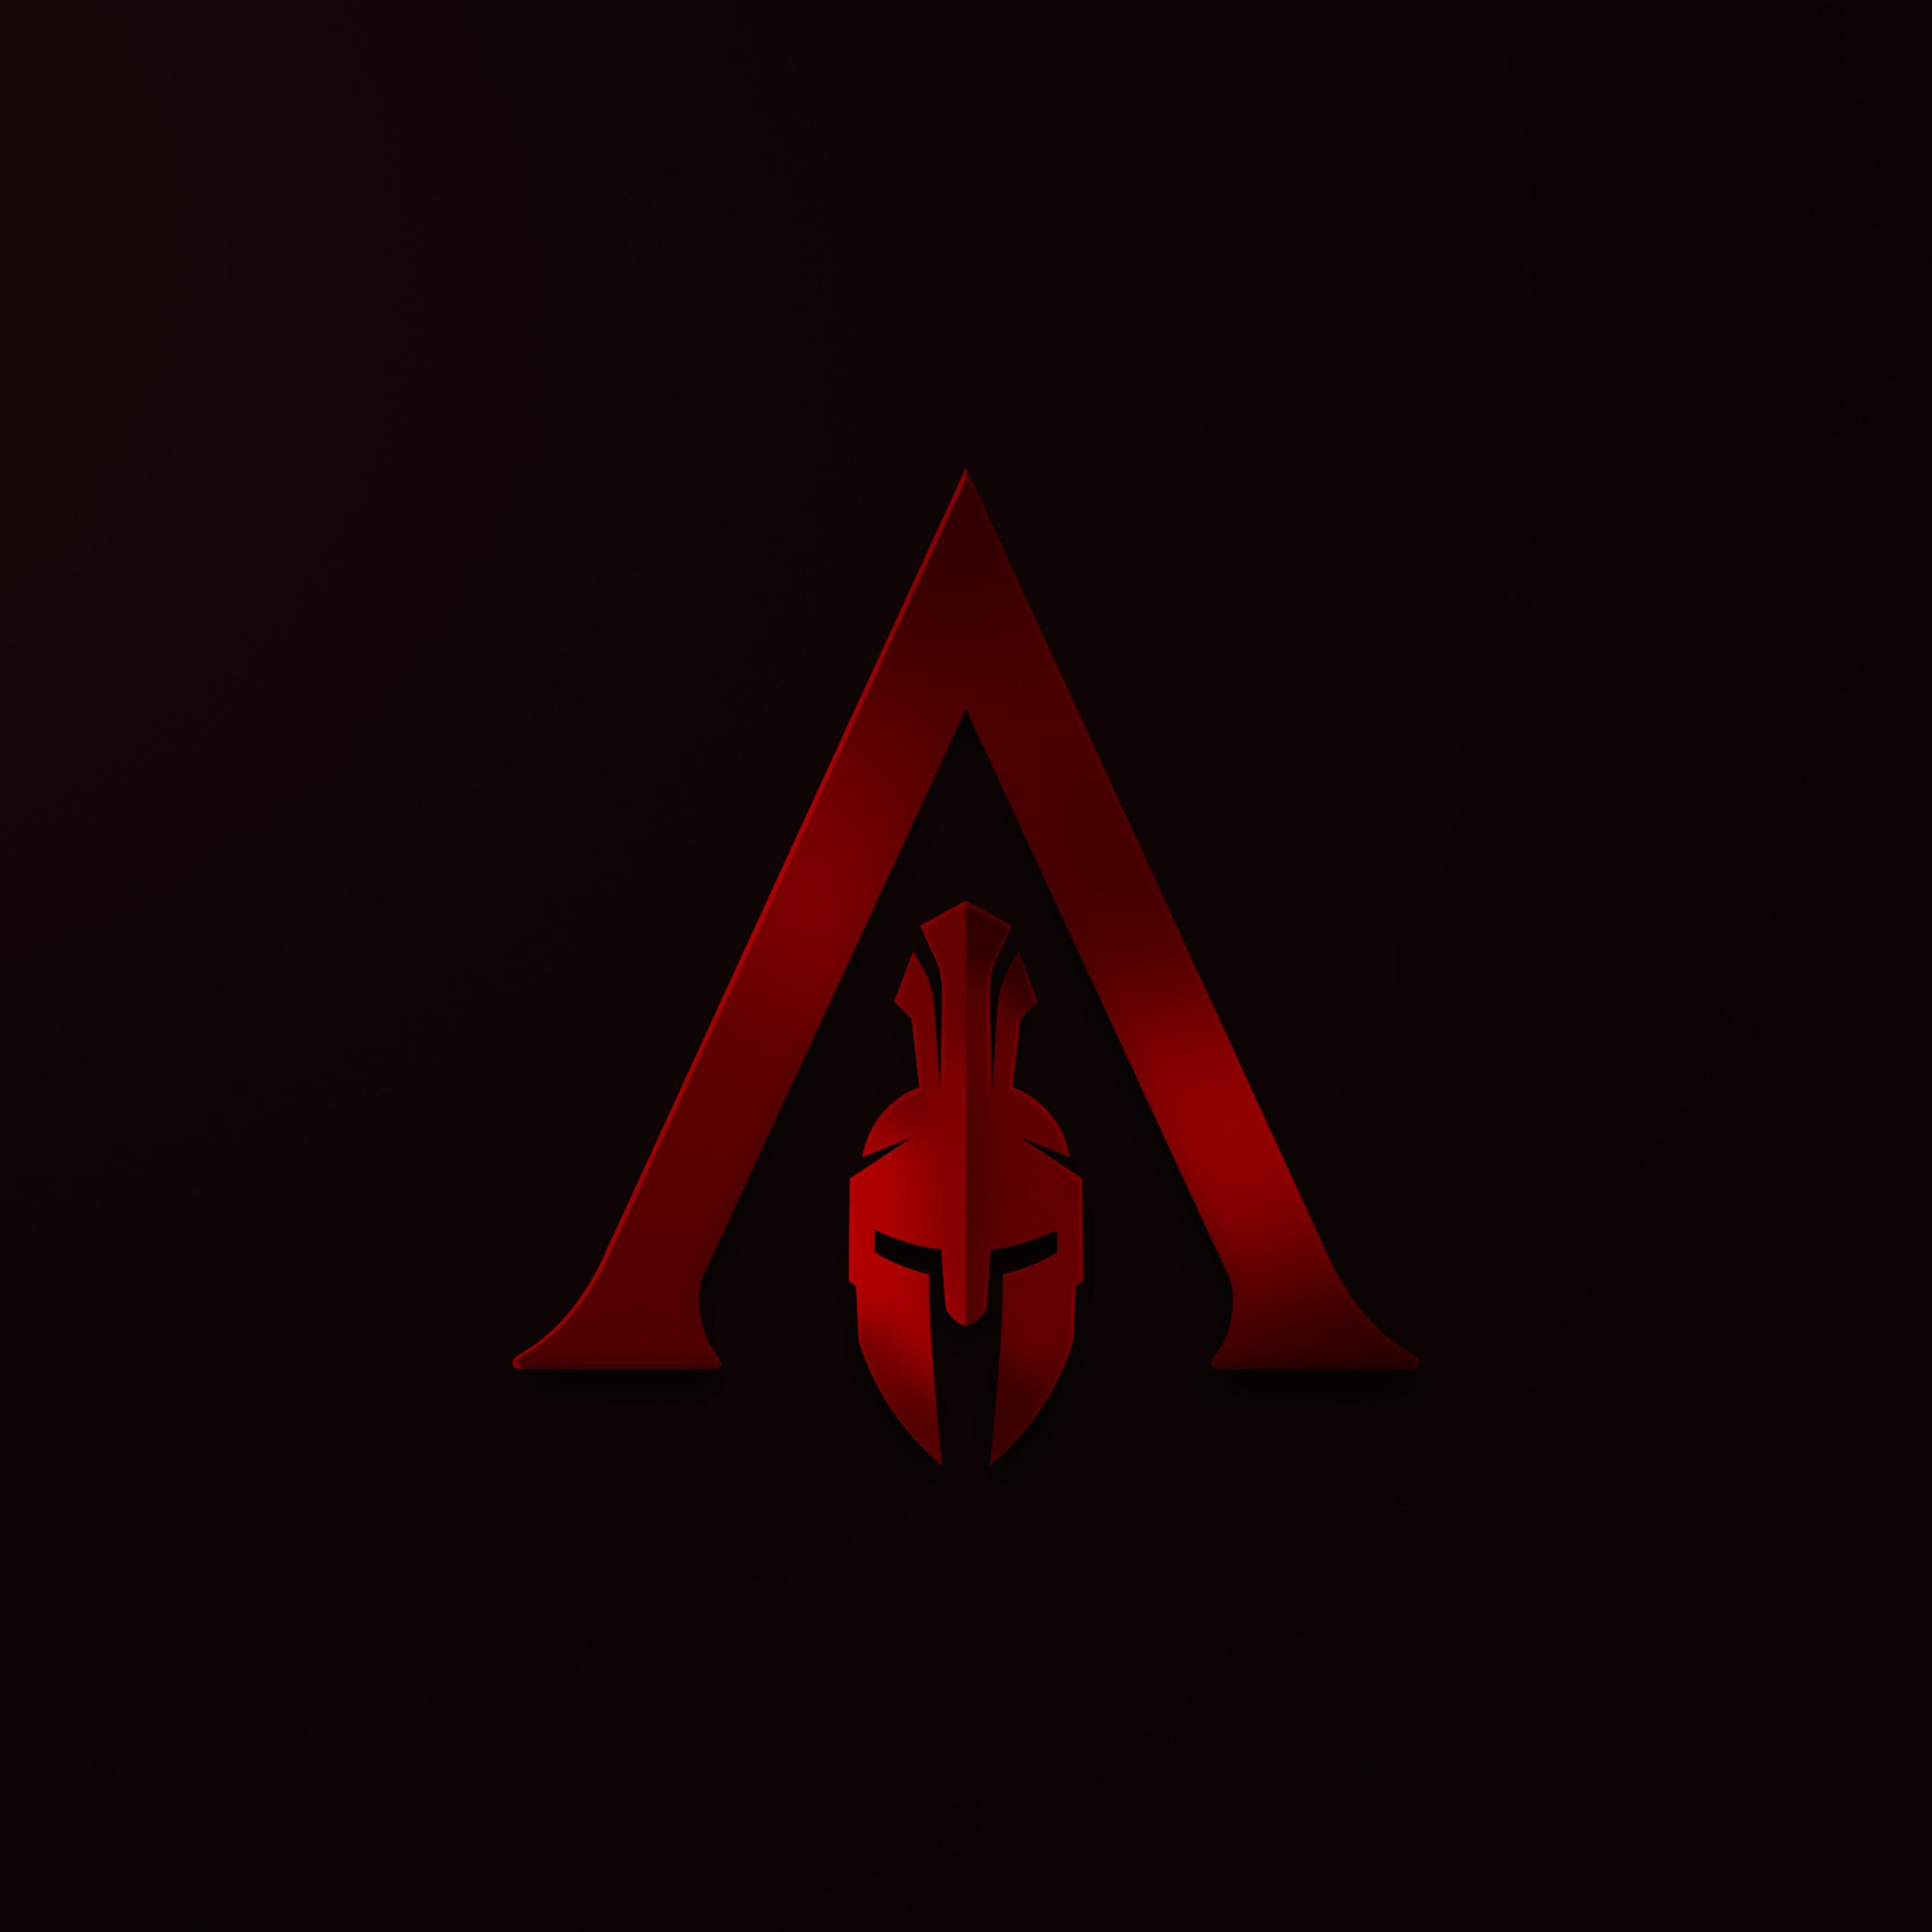 2932x2932 Assassins Creed Odyssey Minimalism Logo 4k Ipad Pro